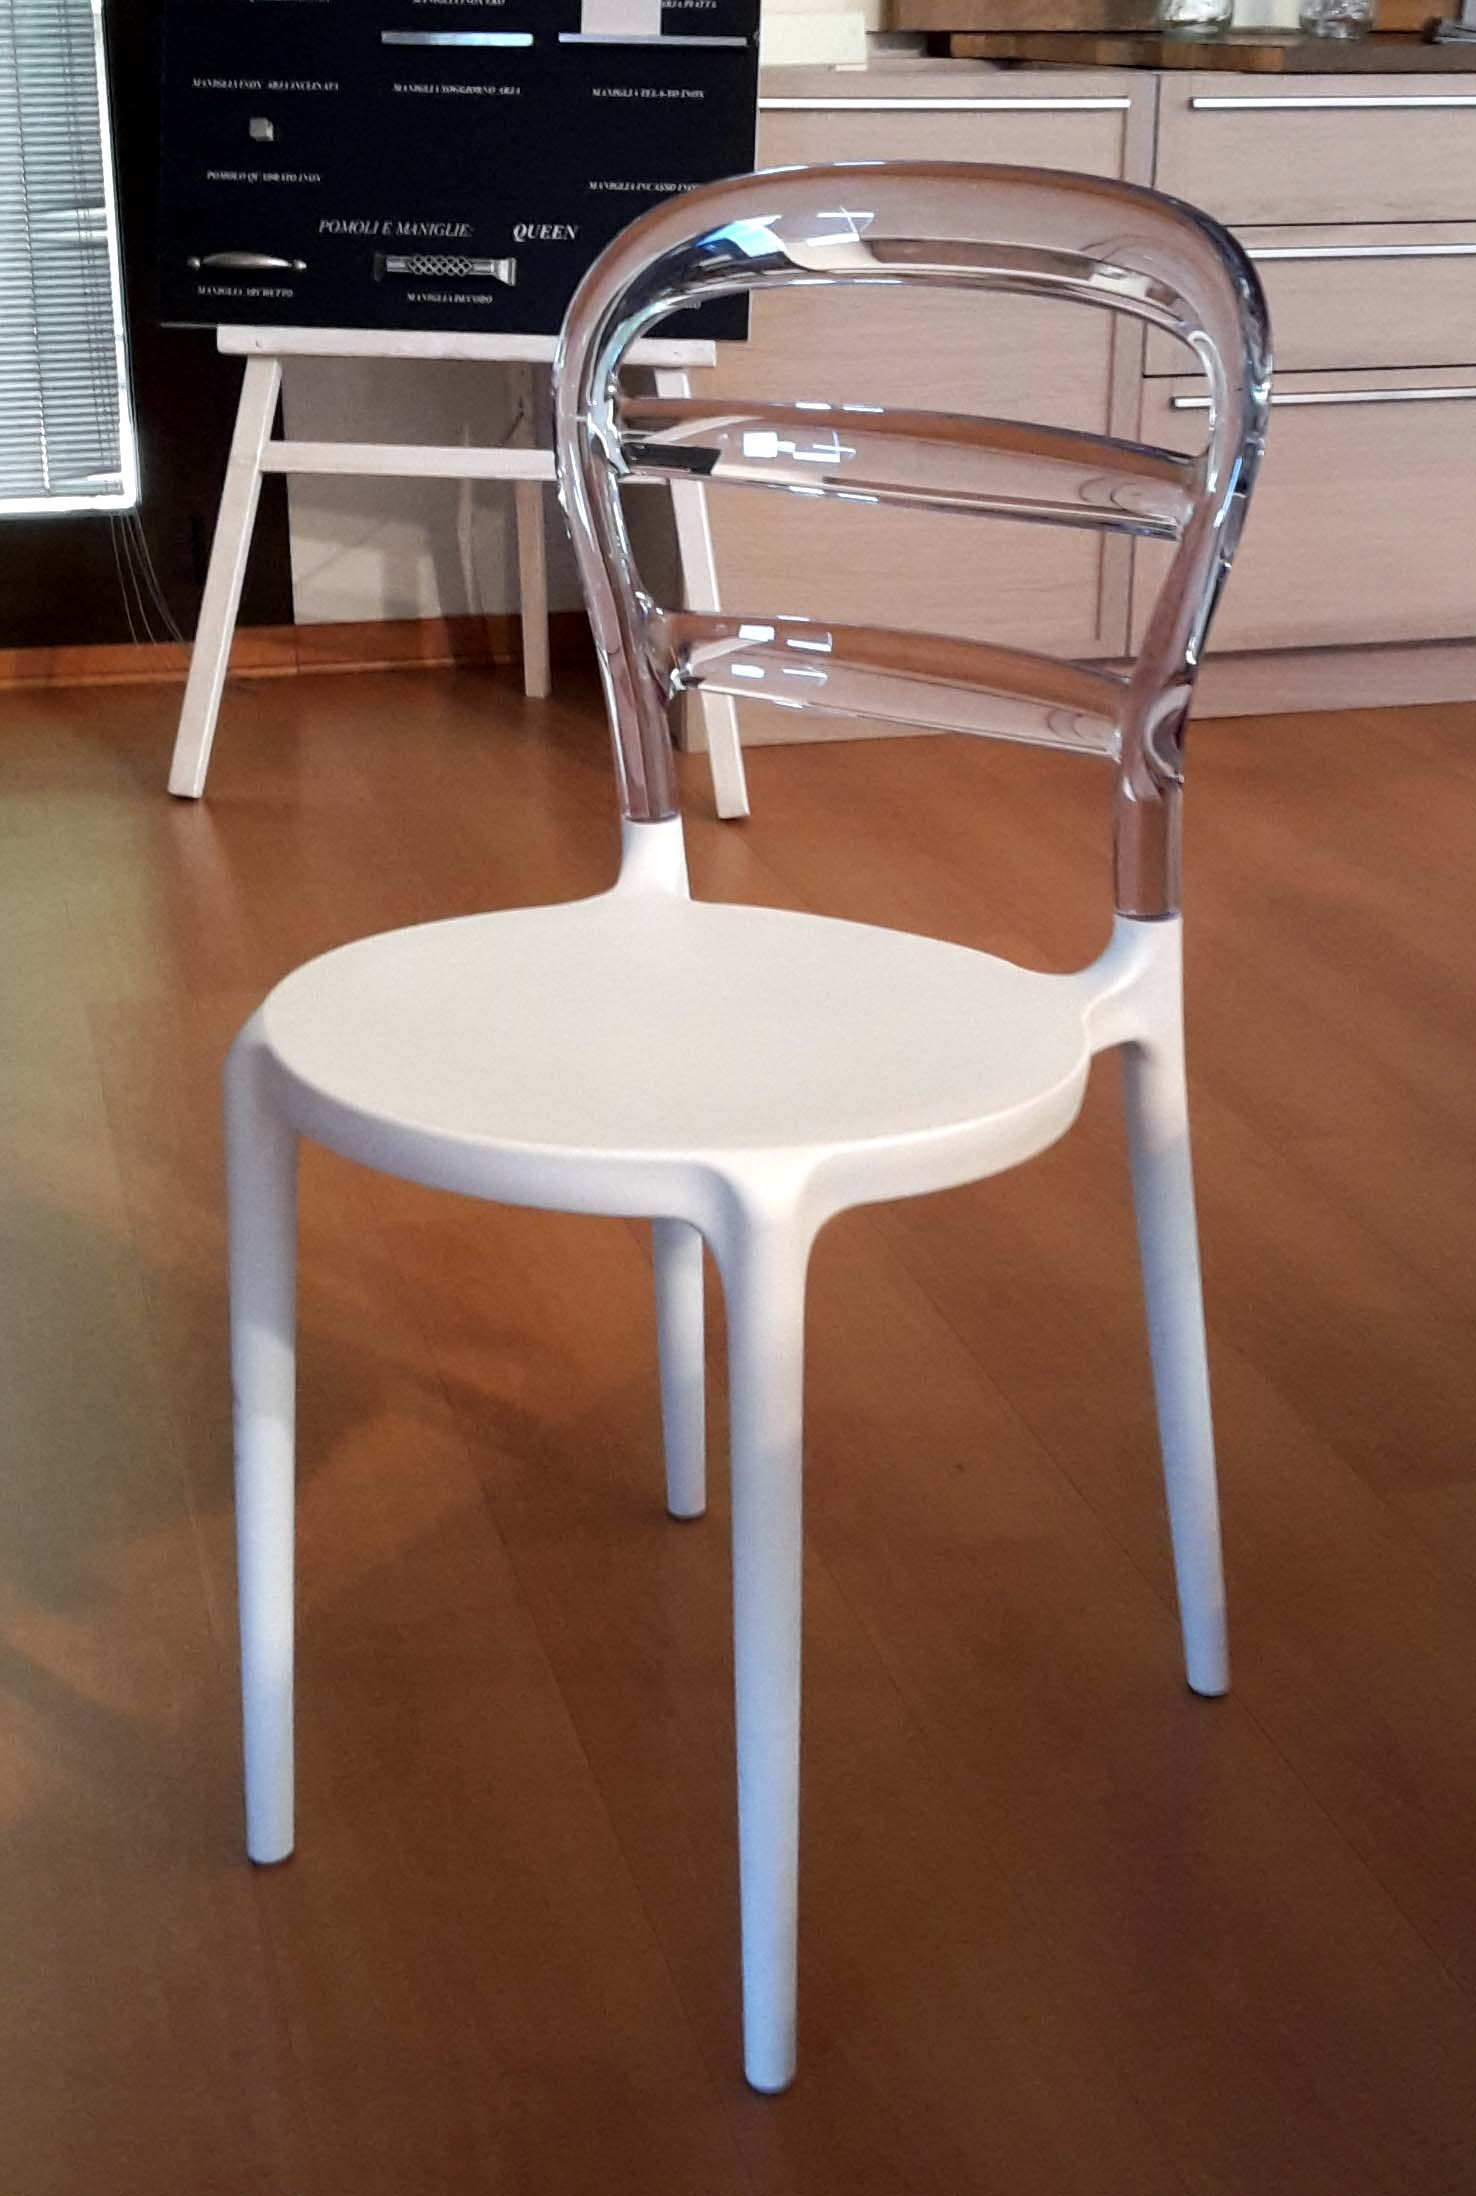 Sedia eurosedia free sedie a prezzi scontati for Sedie di marca